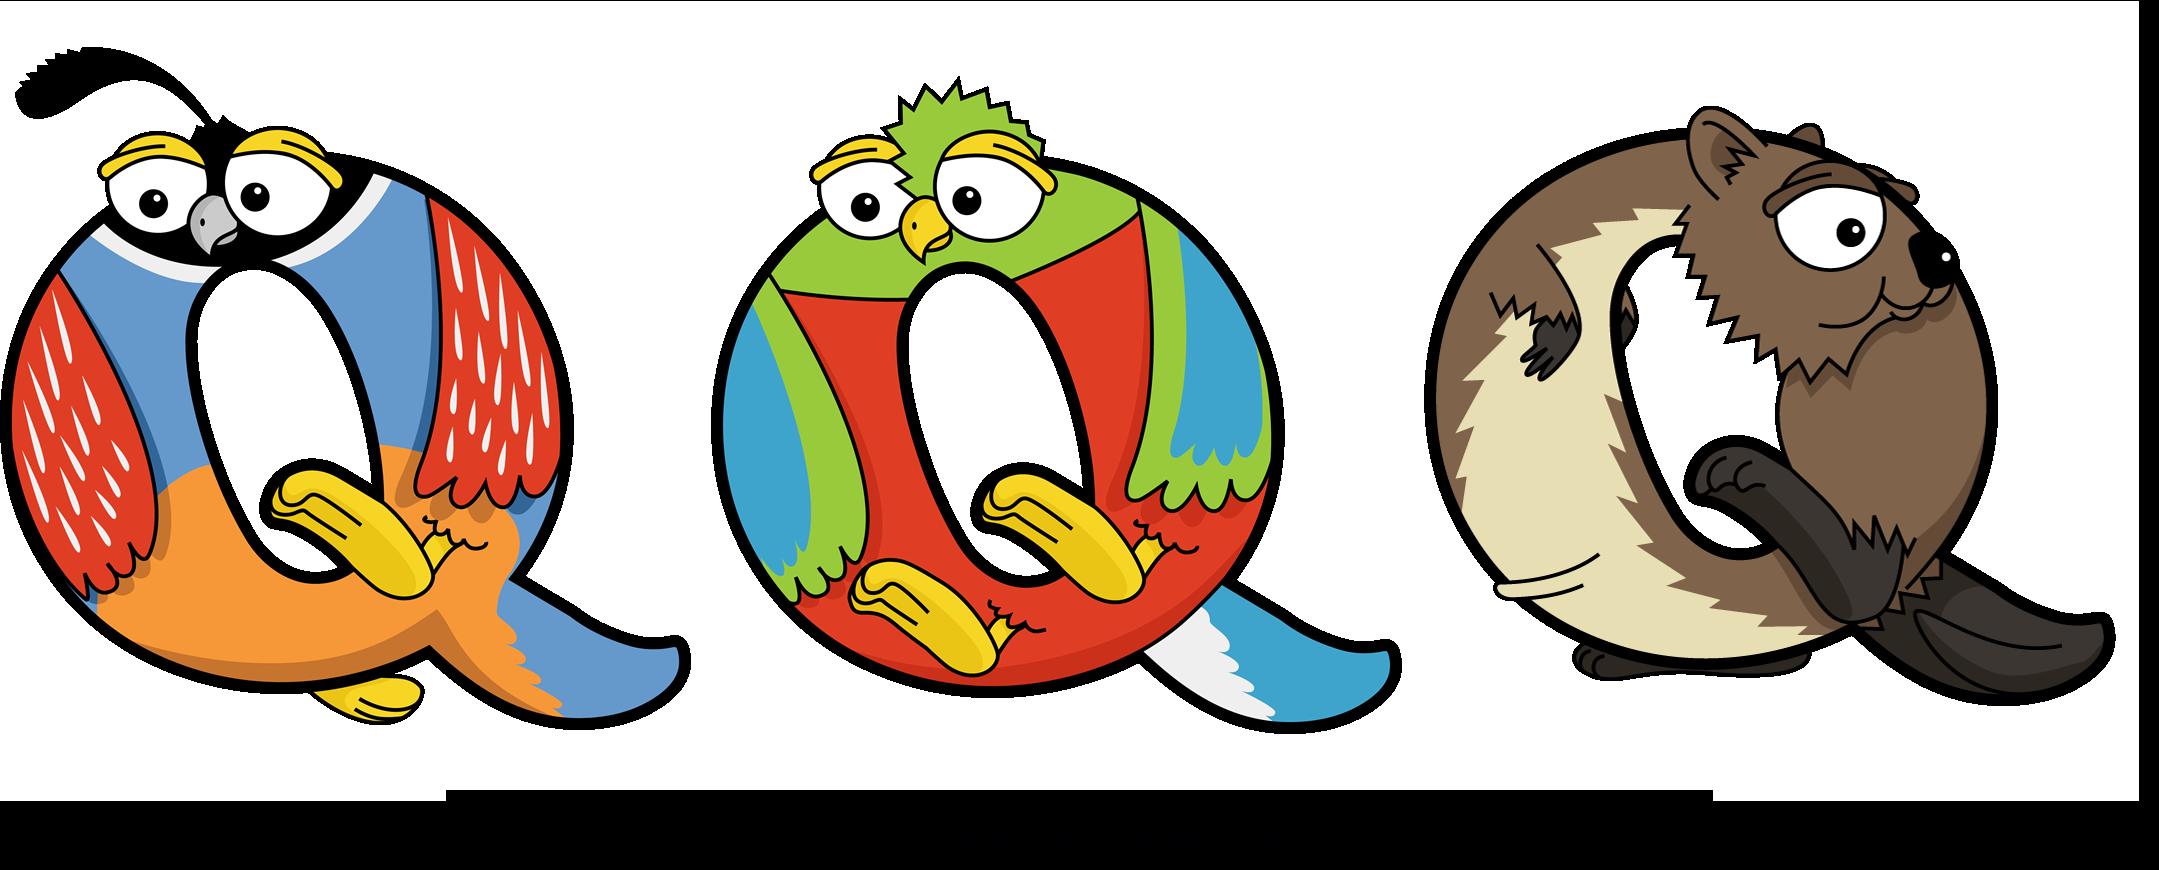 The word QQQ written in cute cartoon animal drawings